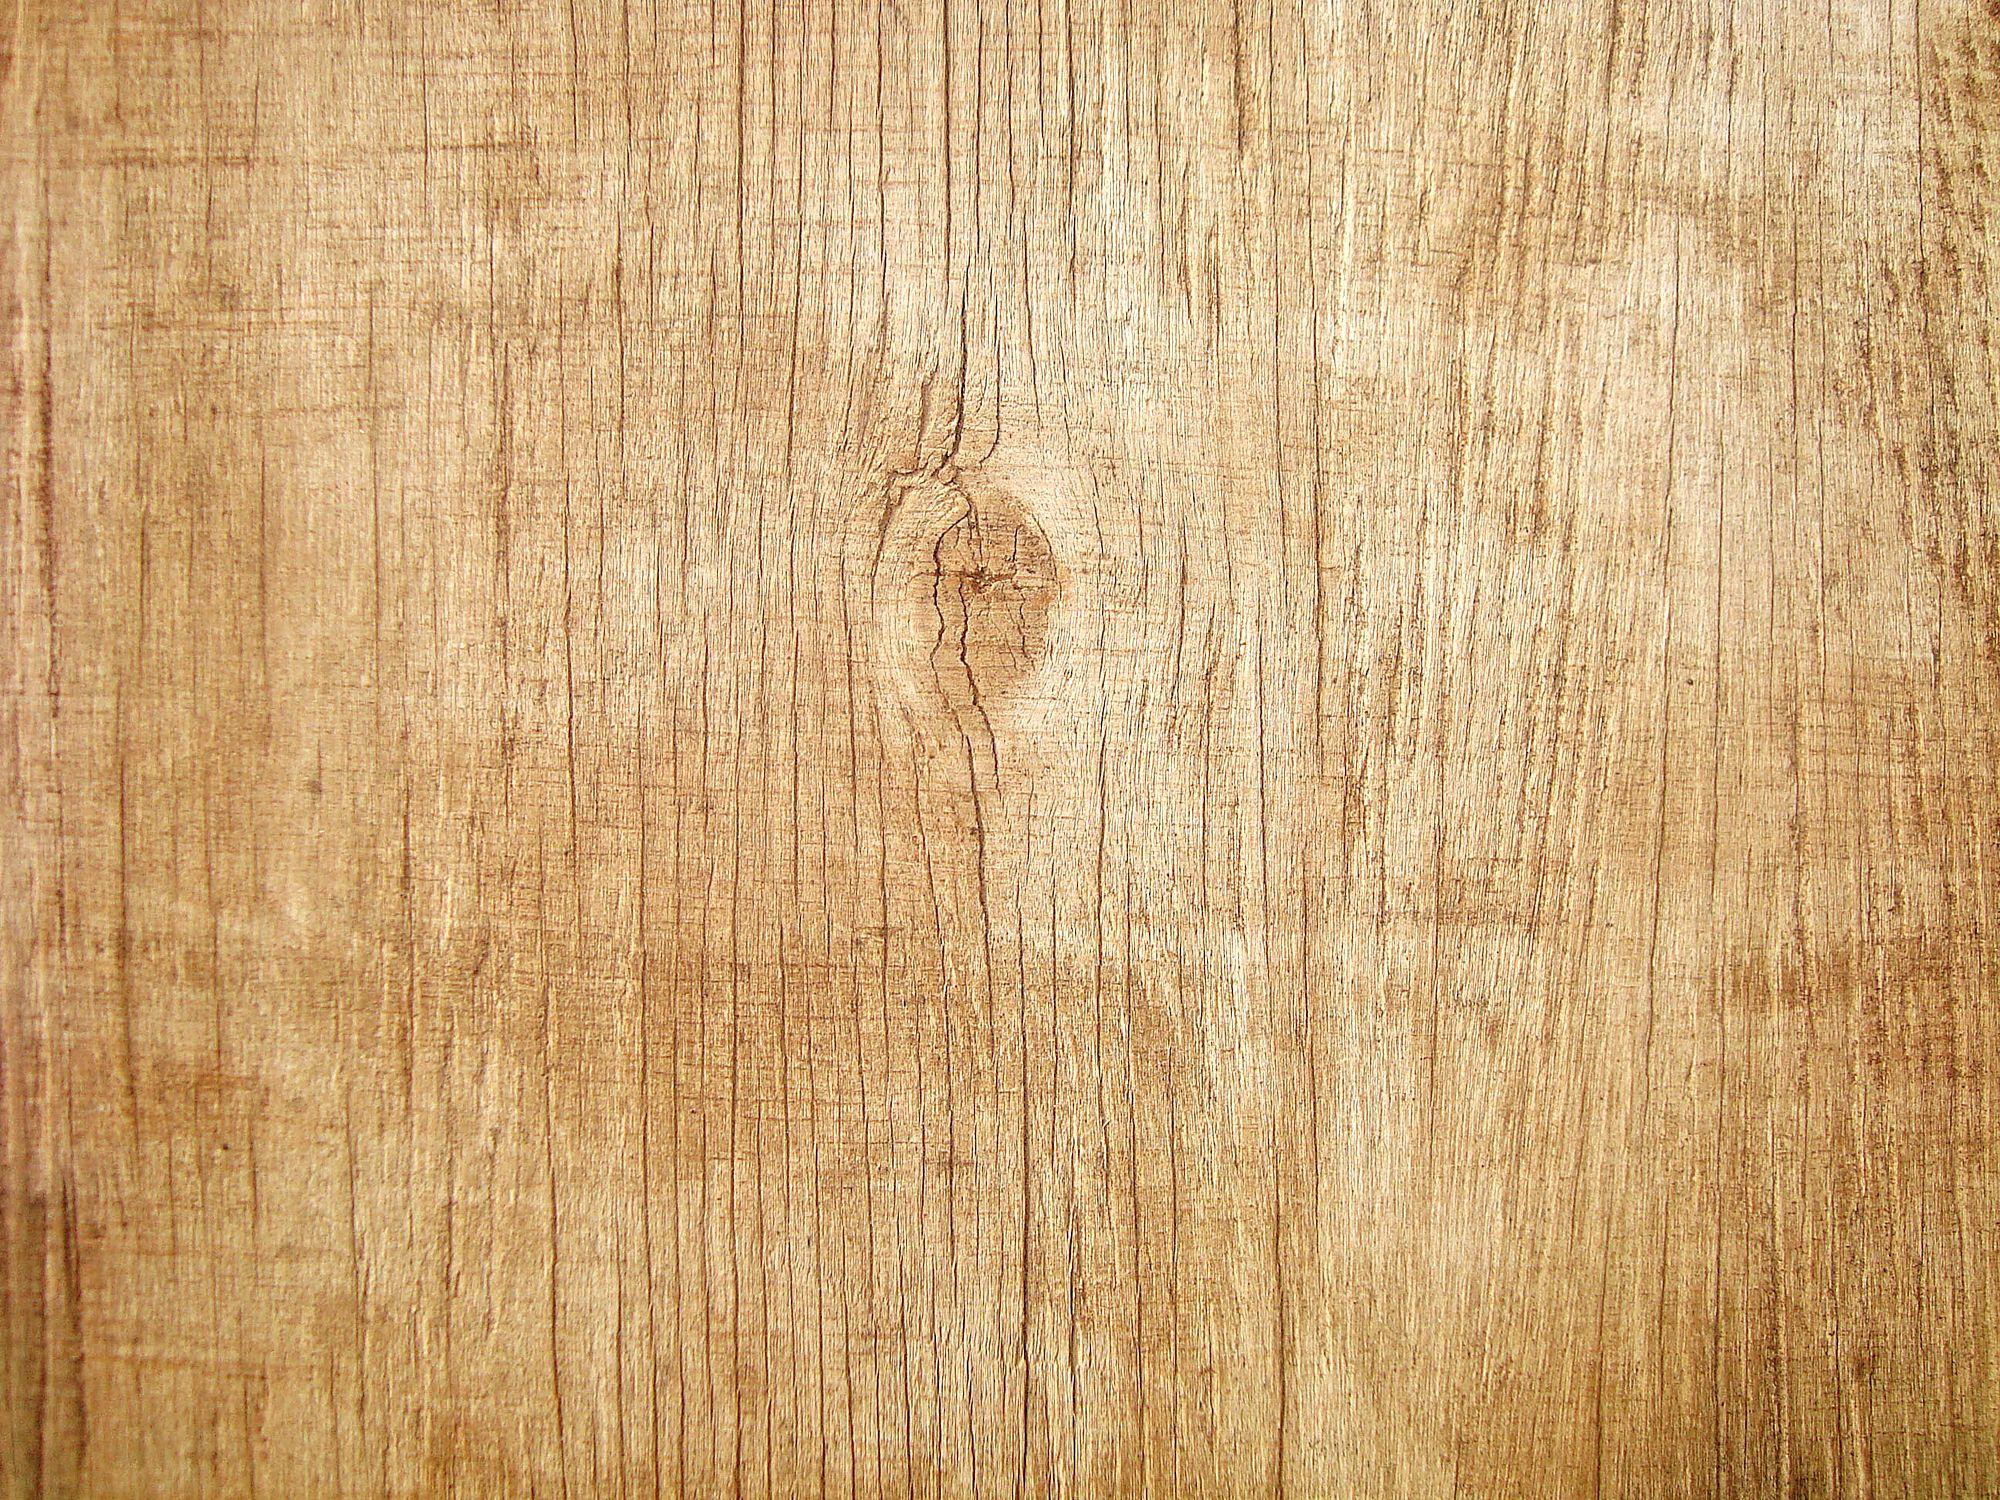 Wood texture design decorating 10720208 other ideas design wood texture design decorating 10720208 other ideas design voltagebd Choice Image